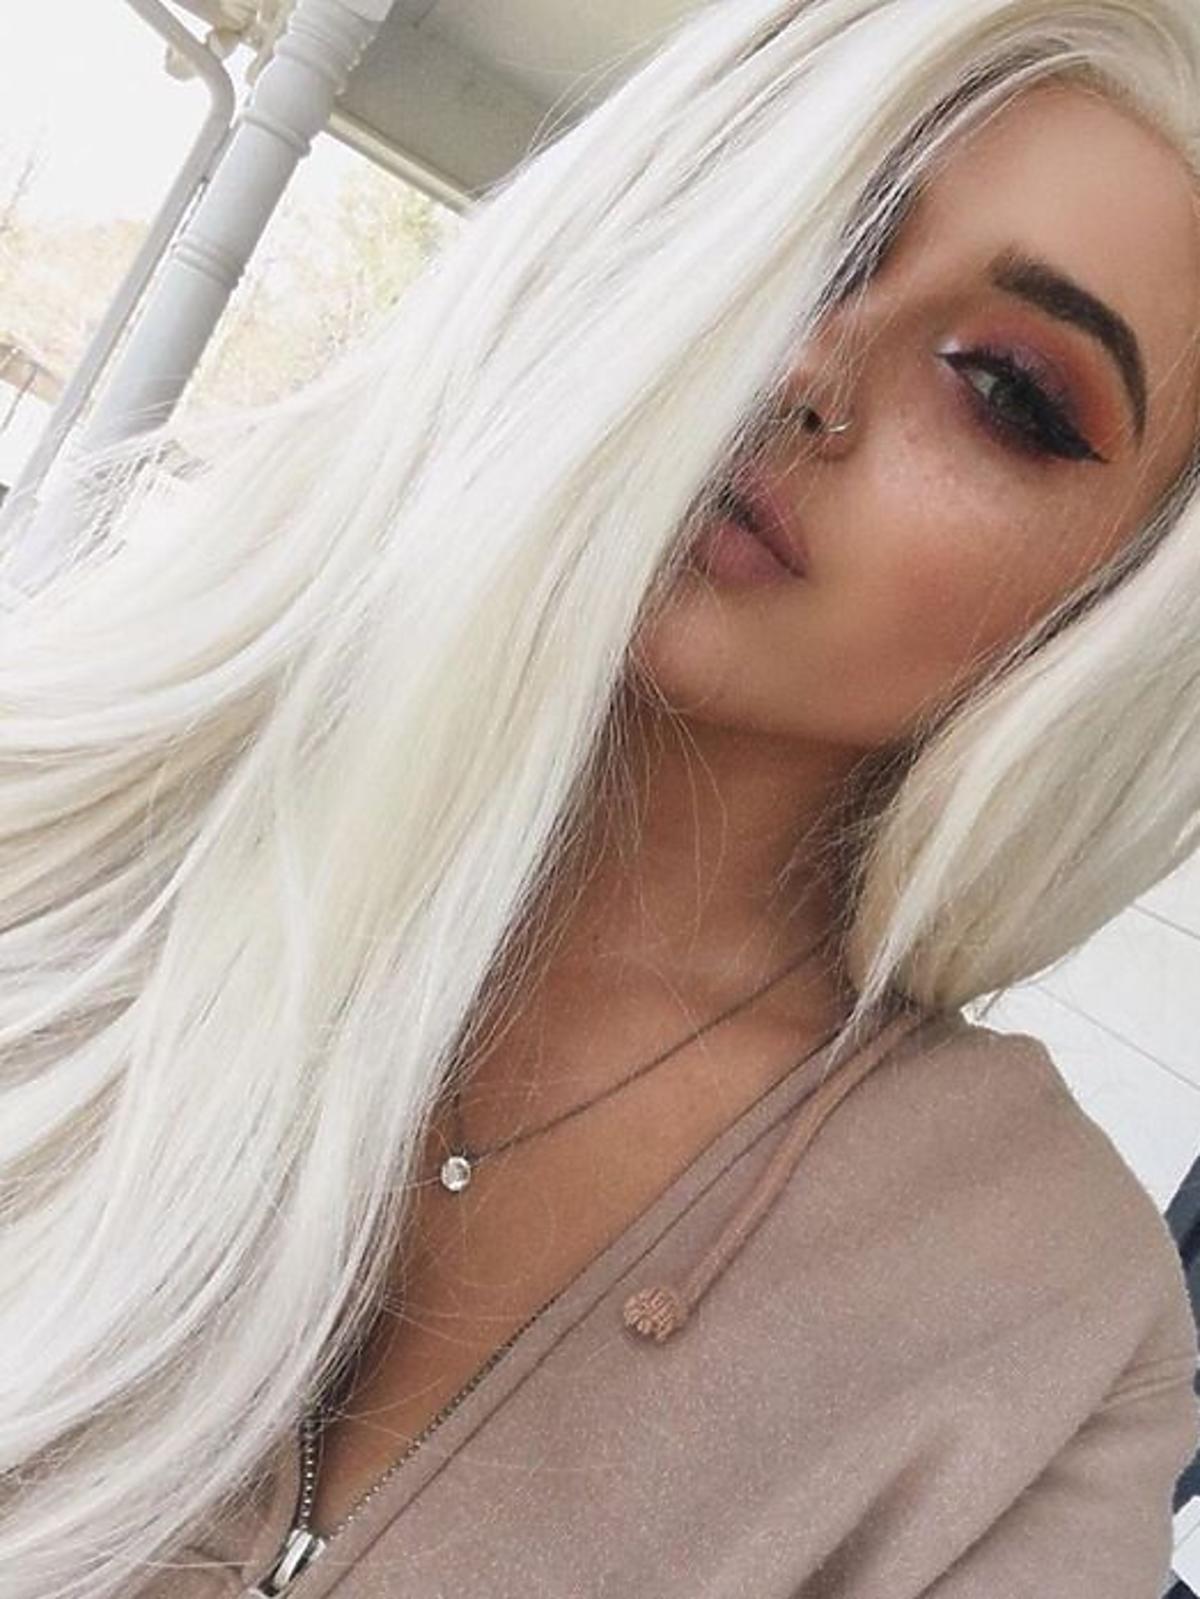 Nordycki blond